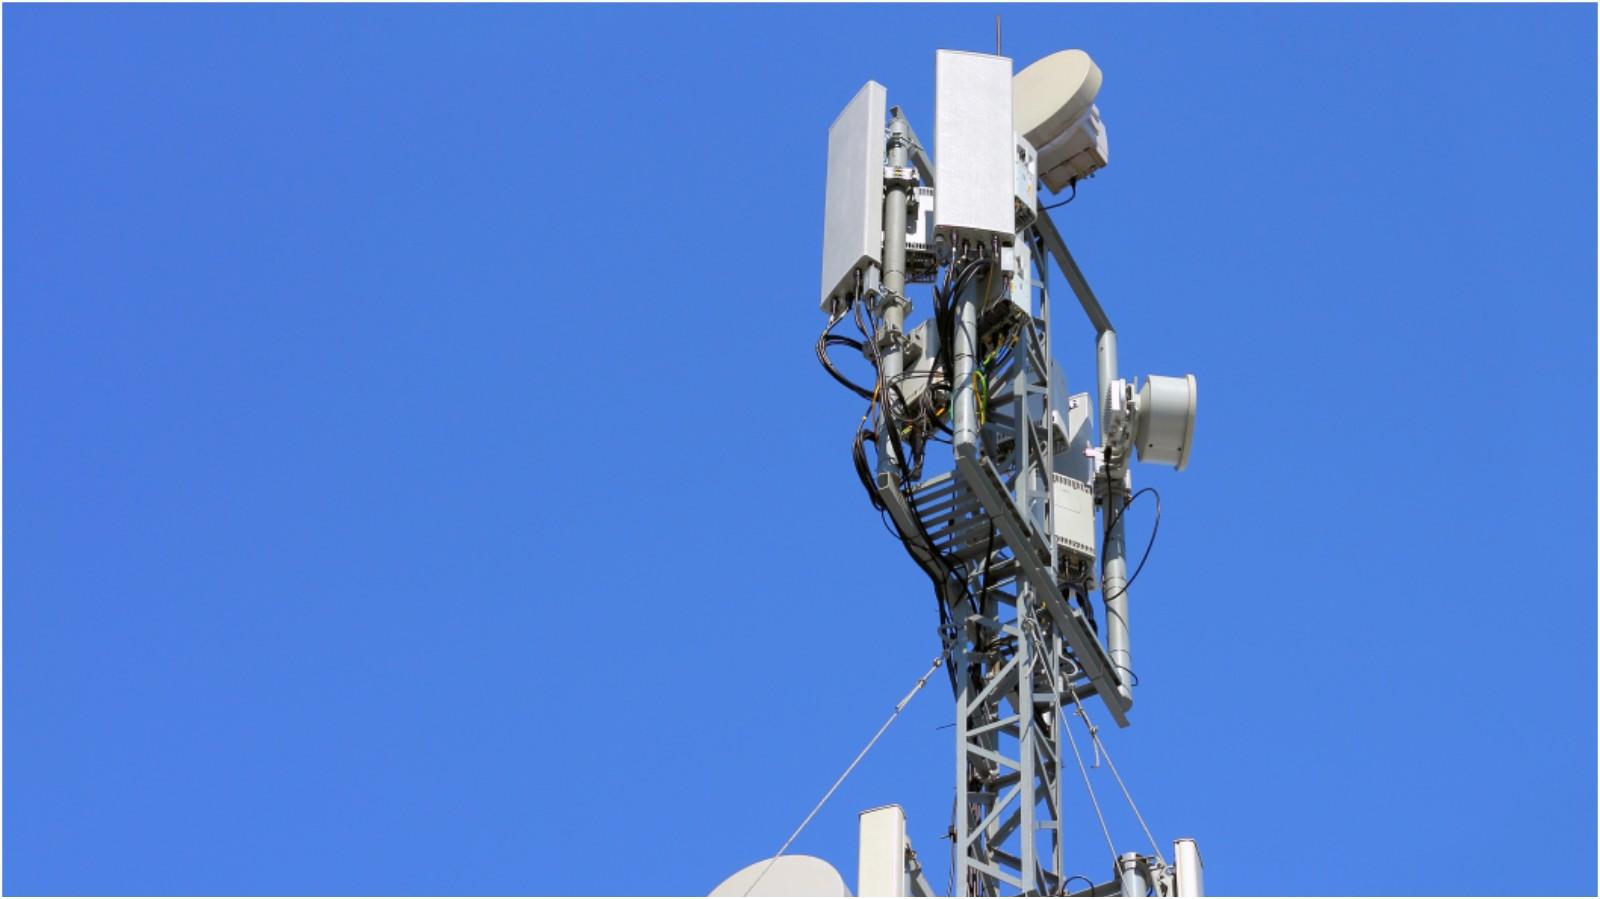 אנטנה סלולרית. צילום אילוסטרציה א.ס.א.פ קריאייטיב/INGIMAGE